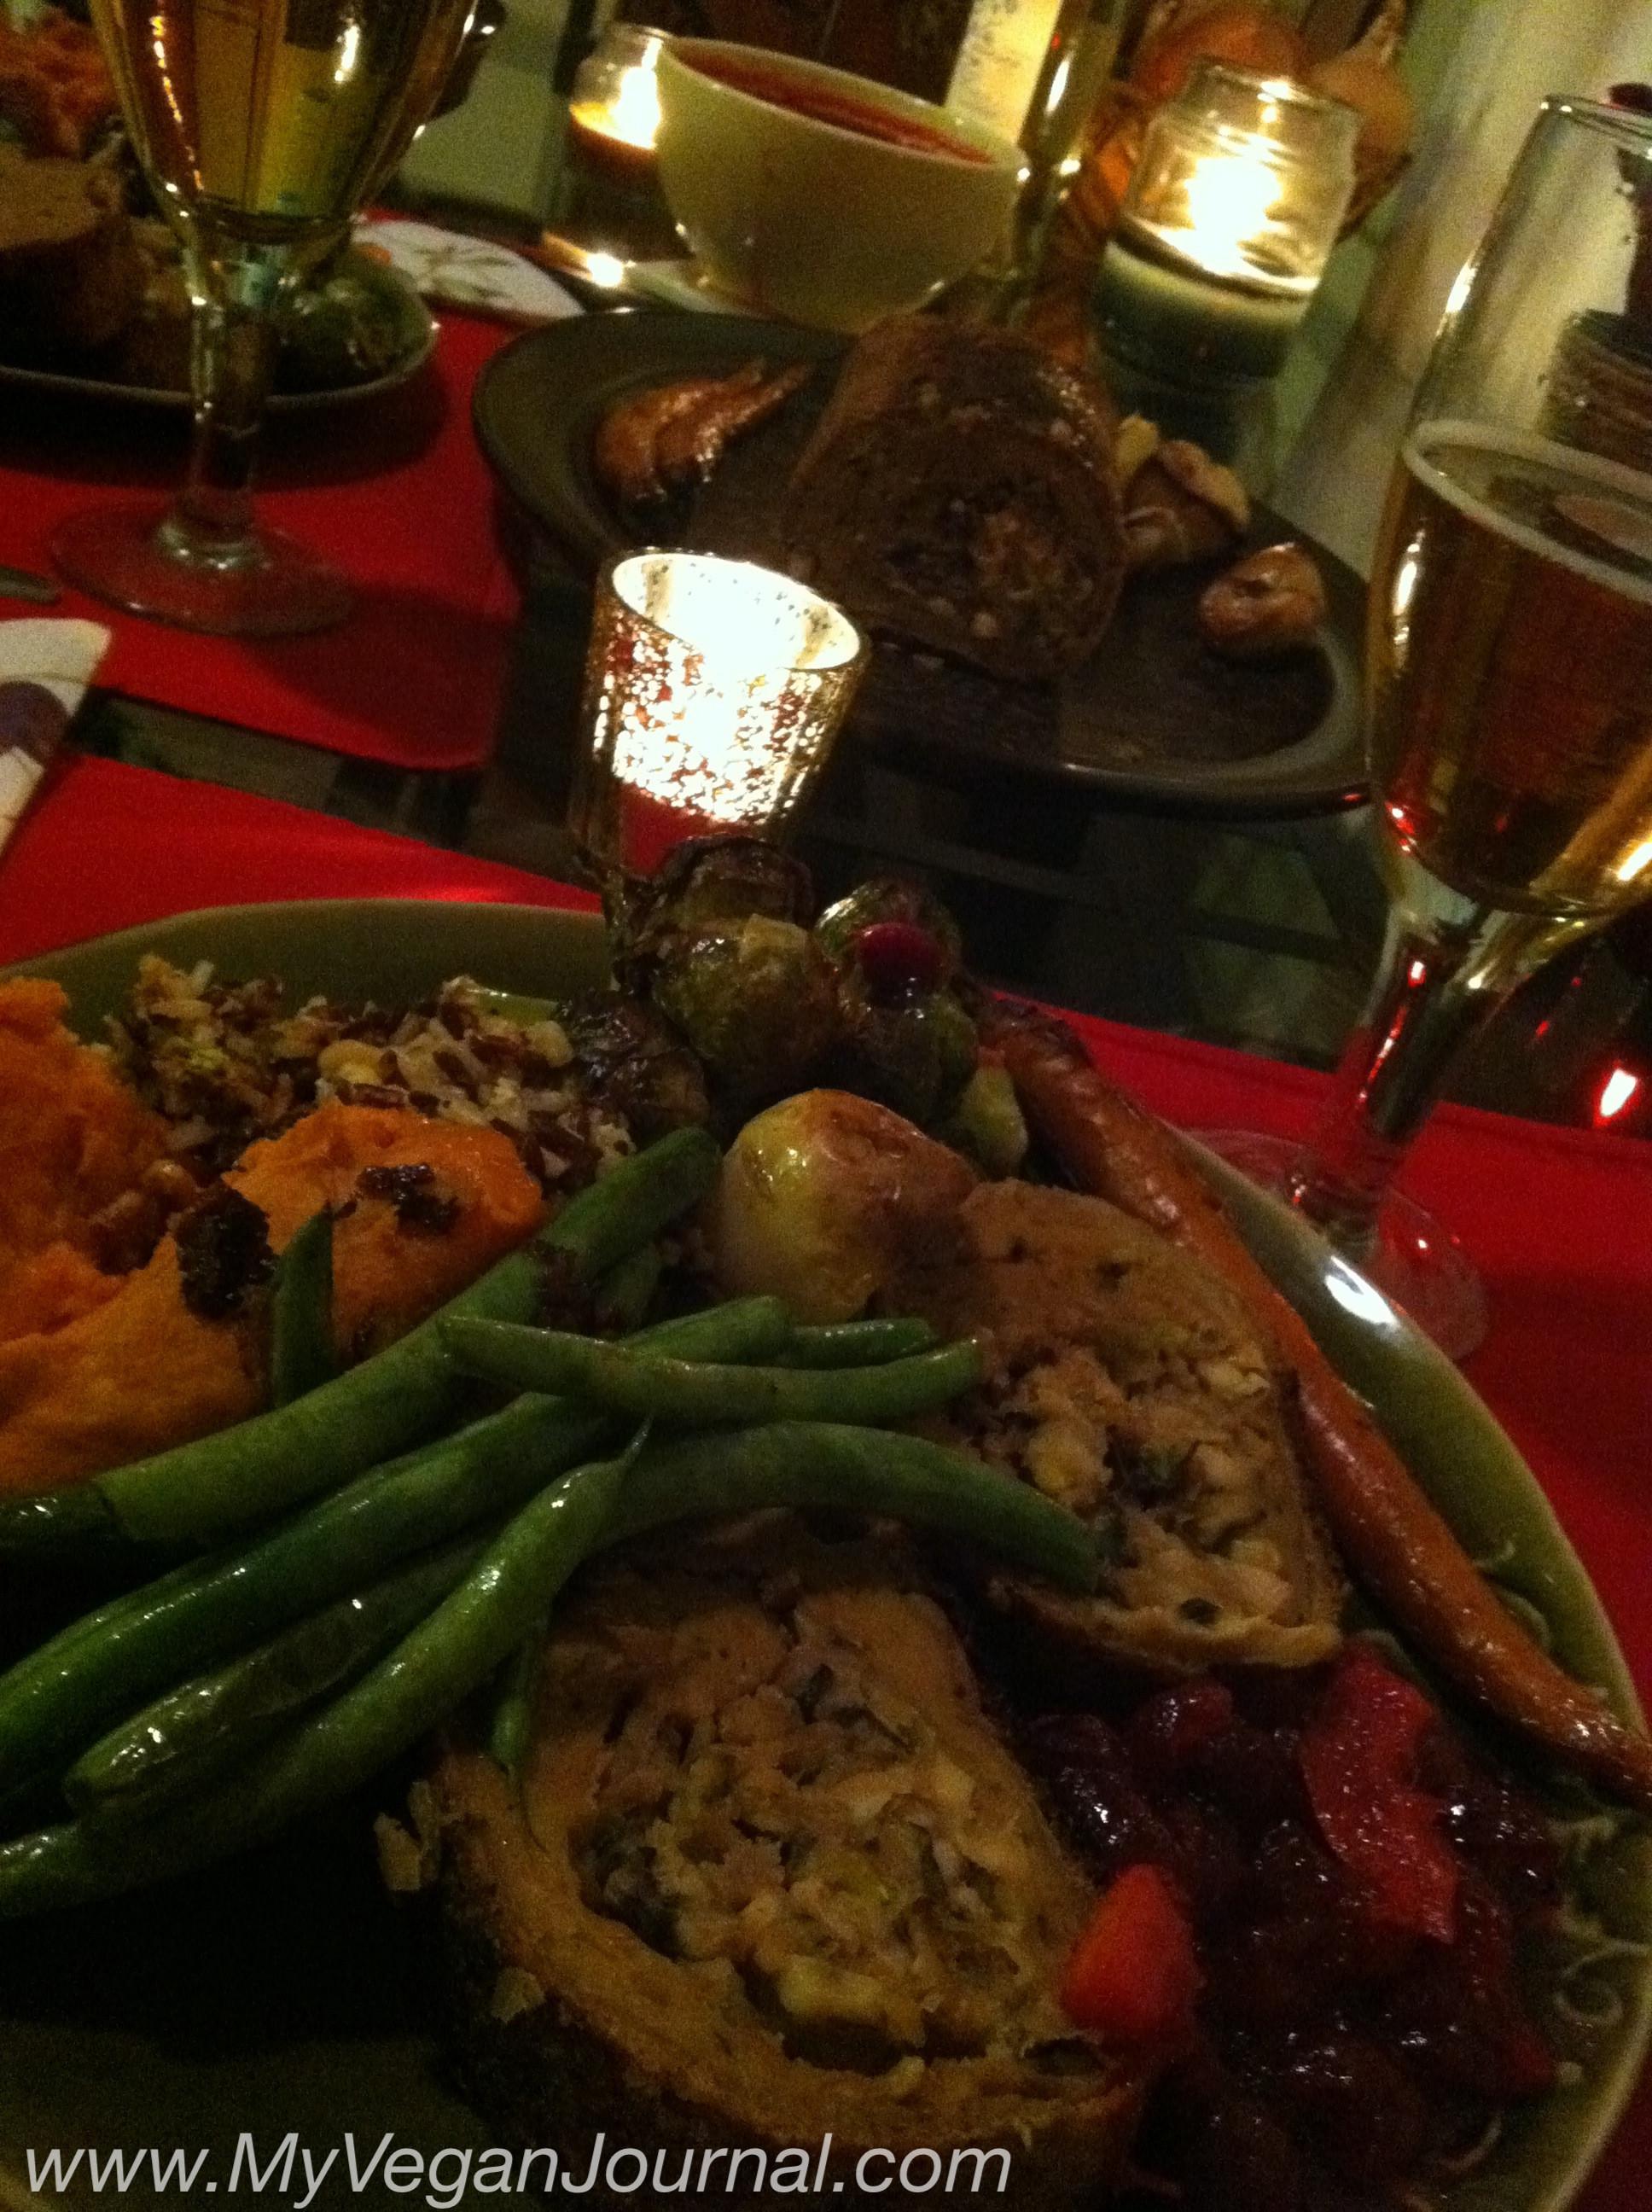 Vegan Thanksgiving Dinner  I made a Vegan Seitan Roast from scratch for the very 1st